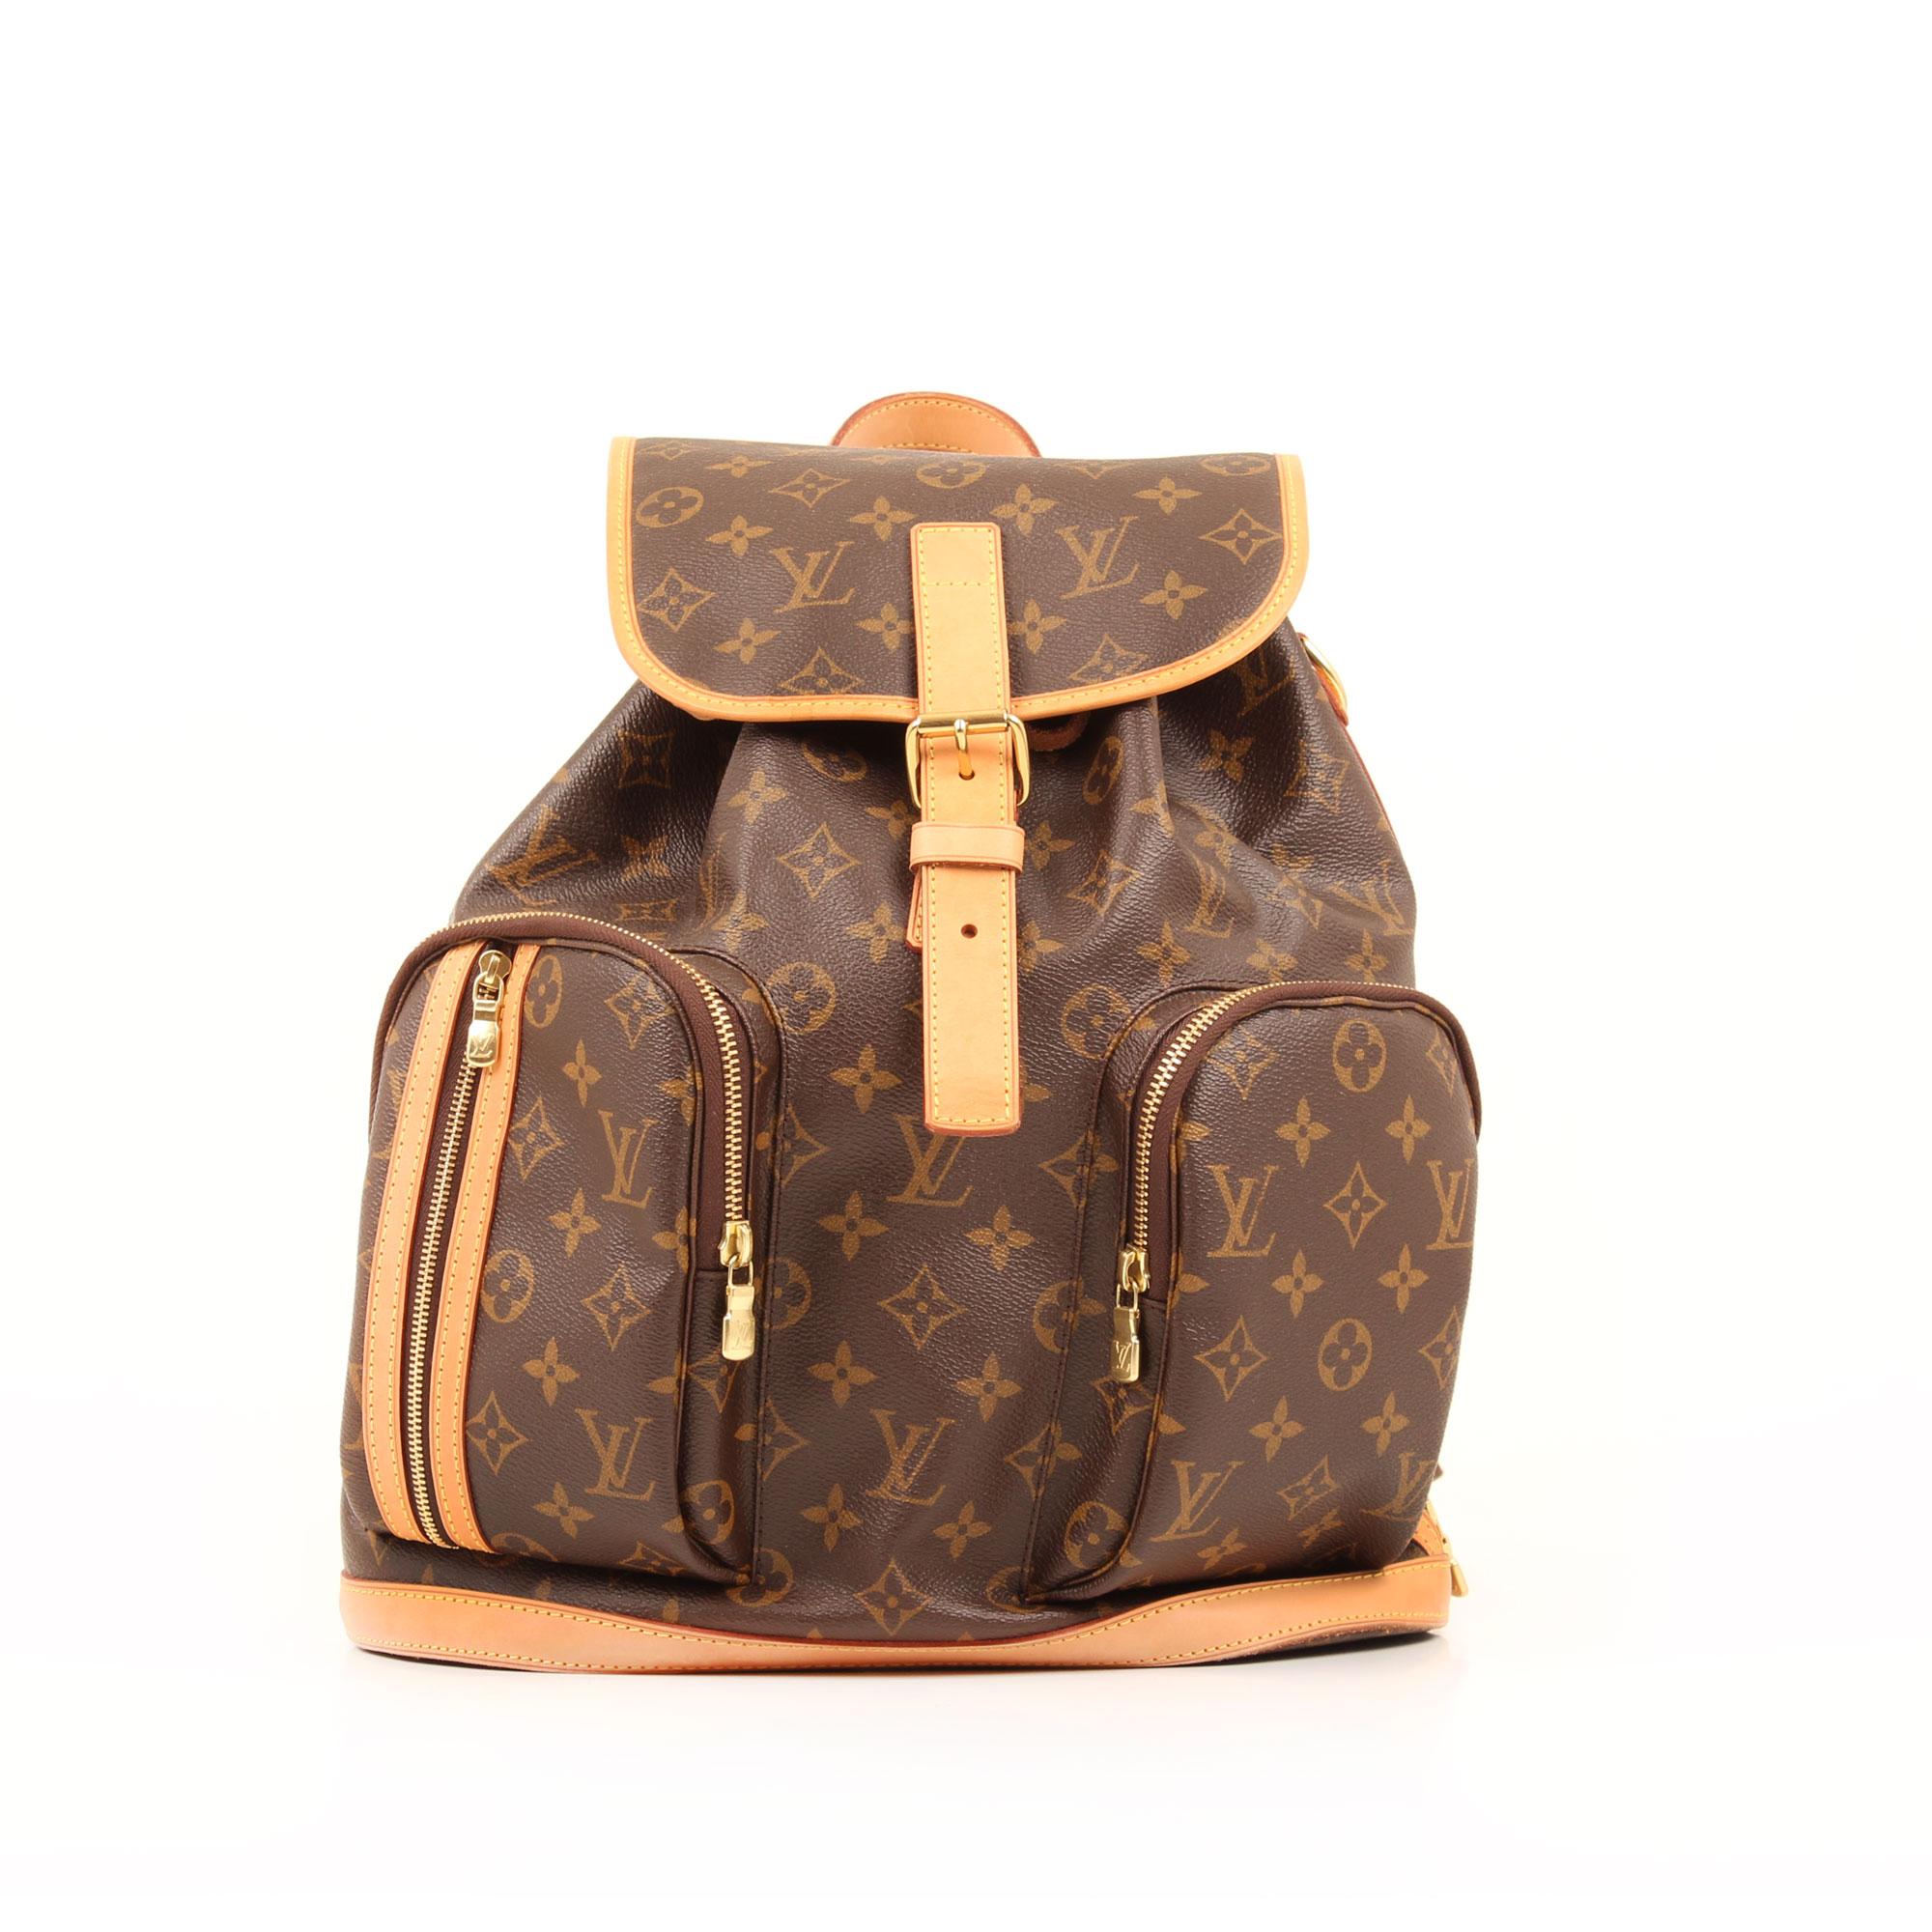 51854e46a818 louis vuitton bosphore monogram backpack front